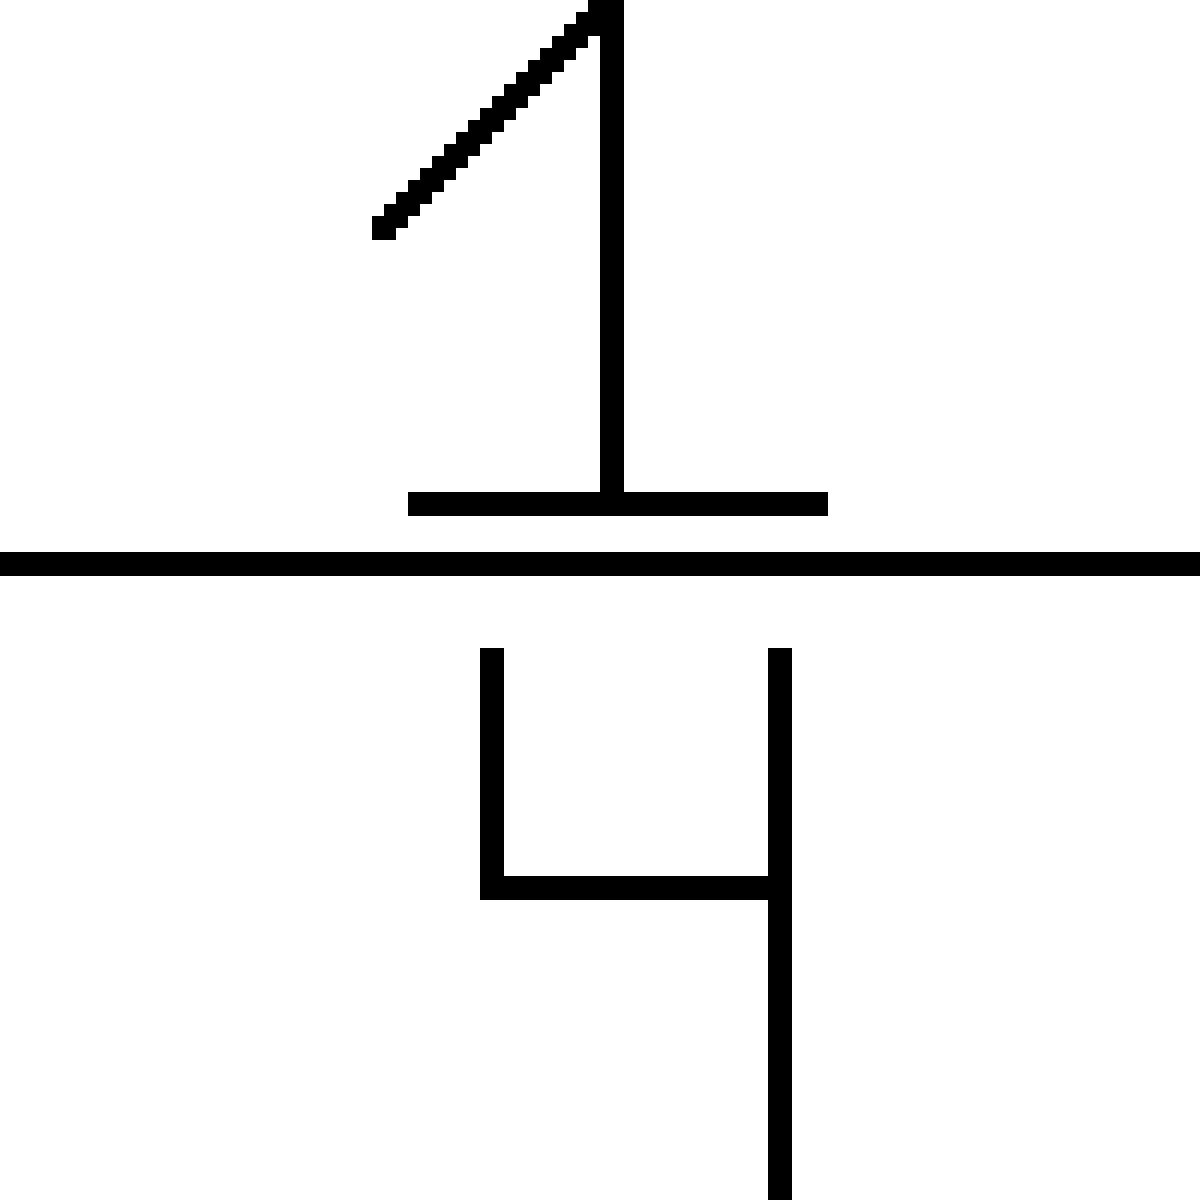 fractions by Zane54329